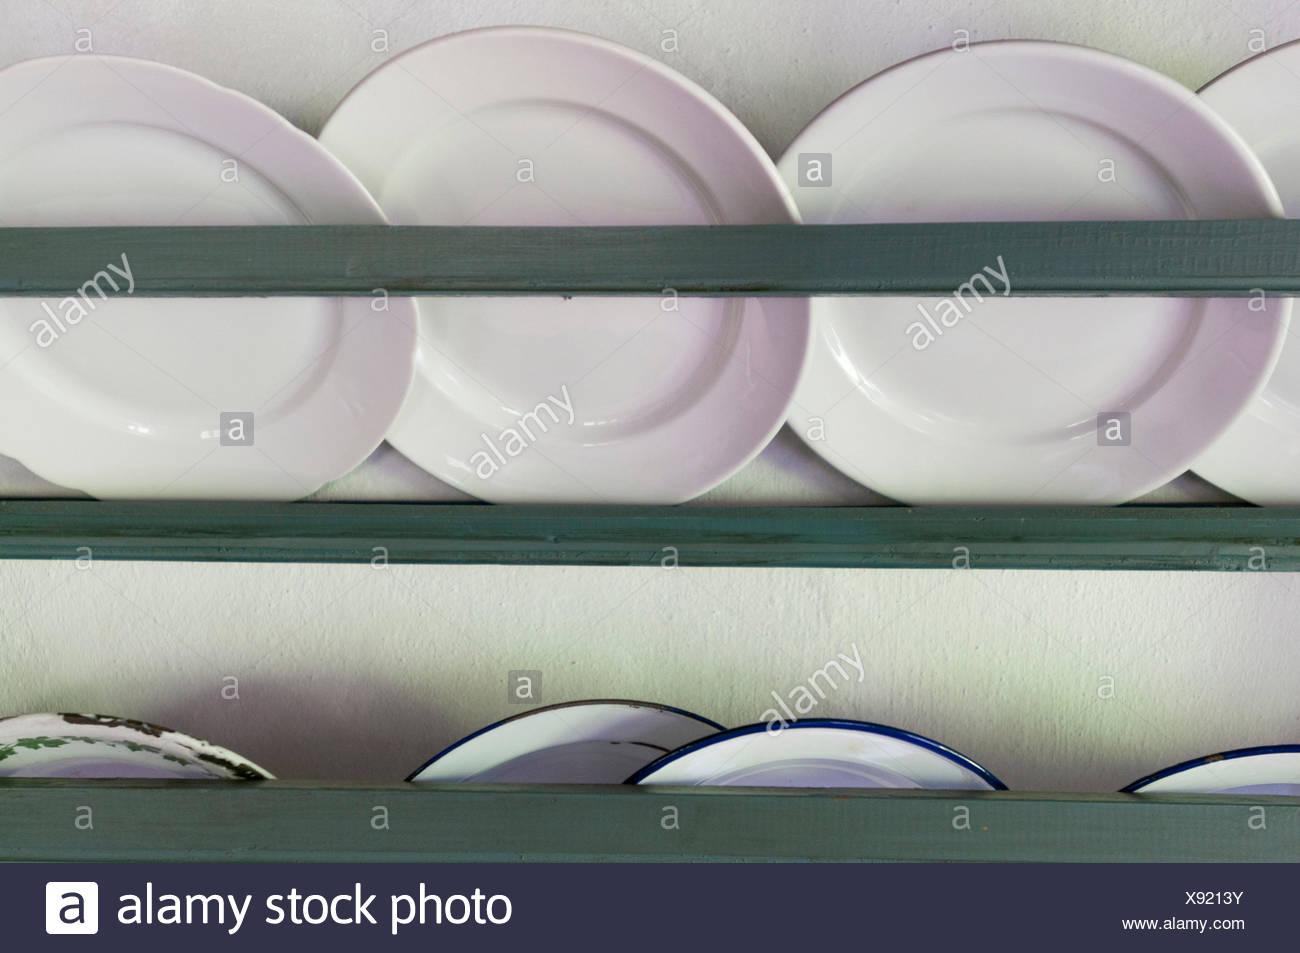 Teller in einem Regal - Stock Image